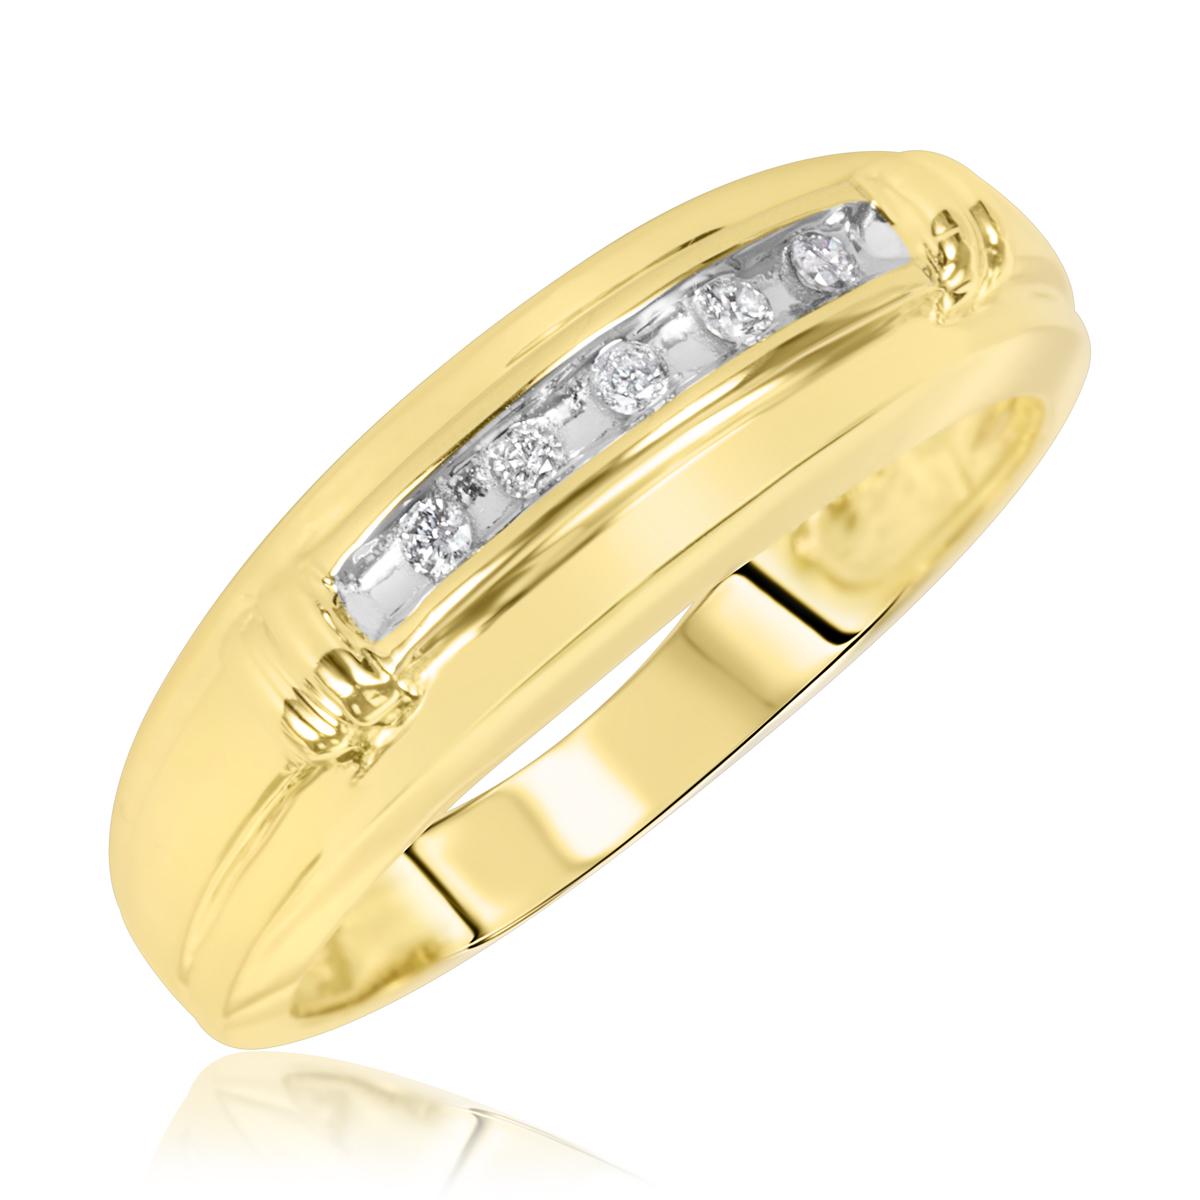 1/10 Carat T.W. Round Cut Diamond Men's Wedding Ring 10K Yellow Gold- Size 8